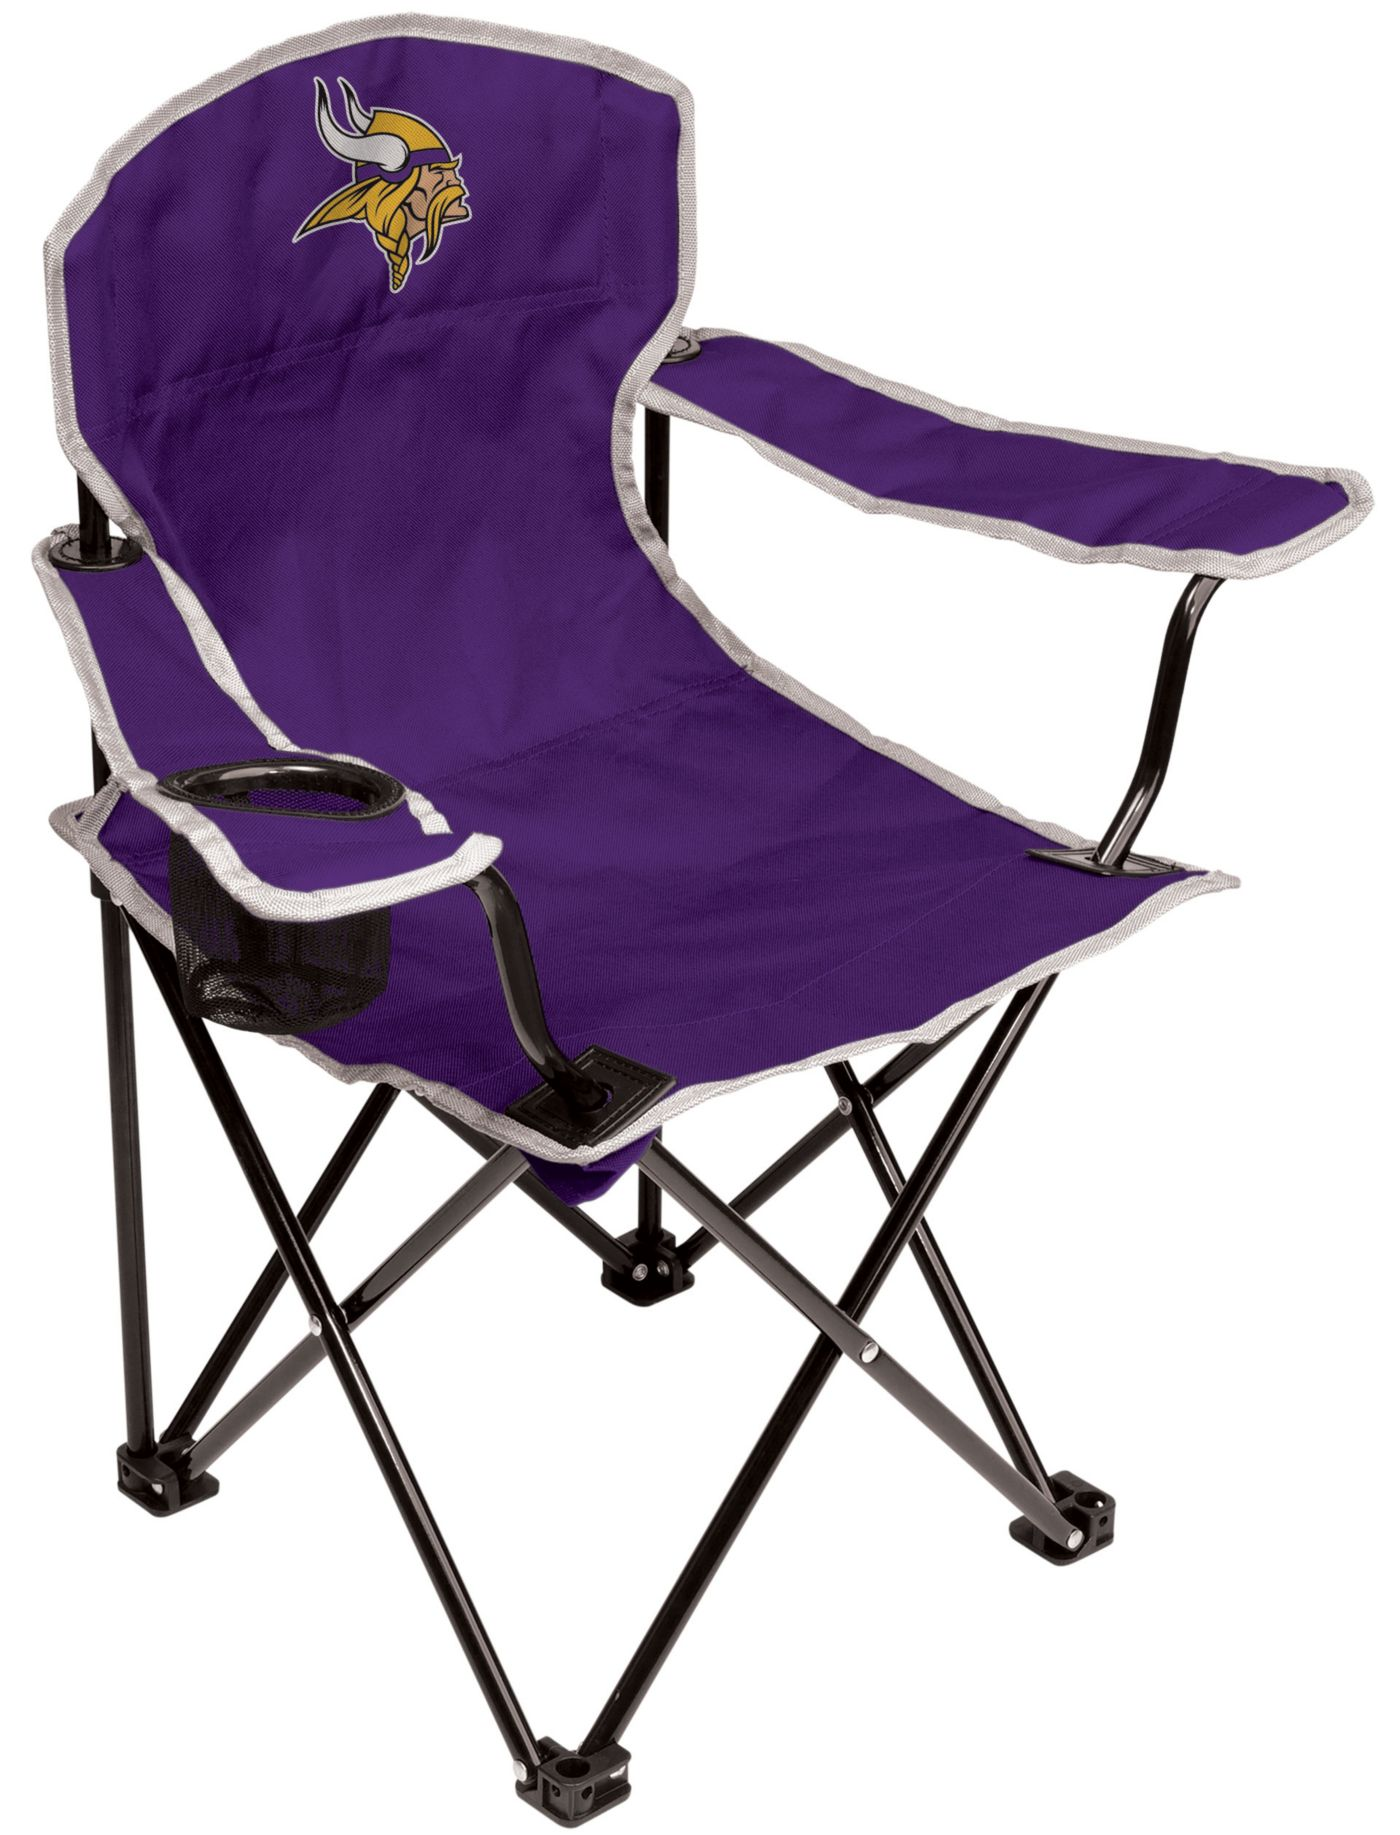 Rawlings Minnesota Vikings Youth Chair